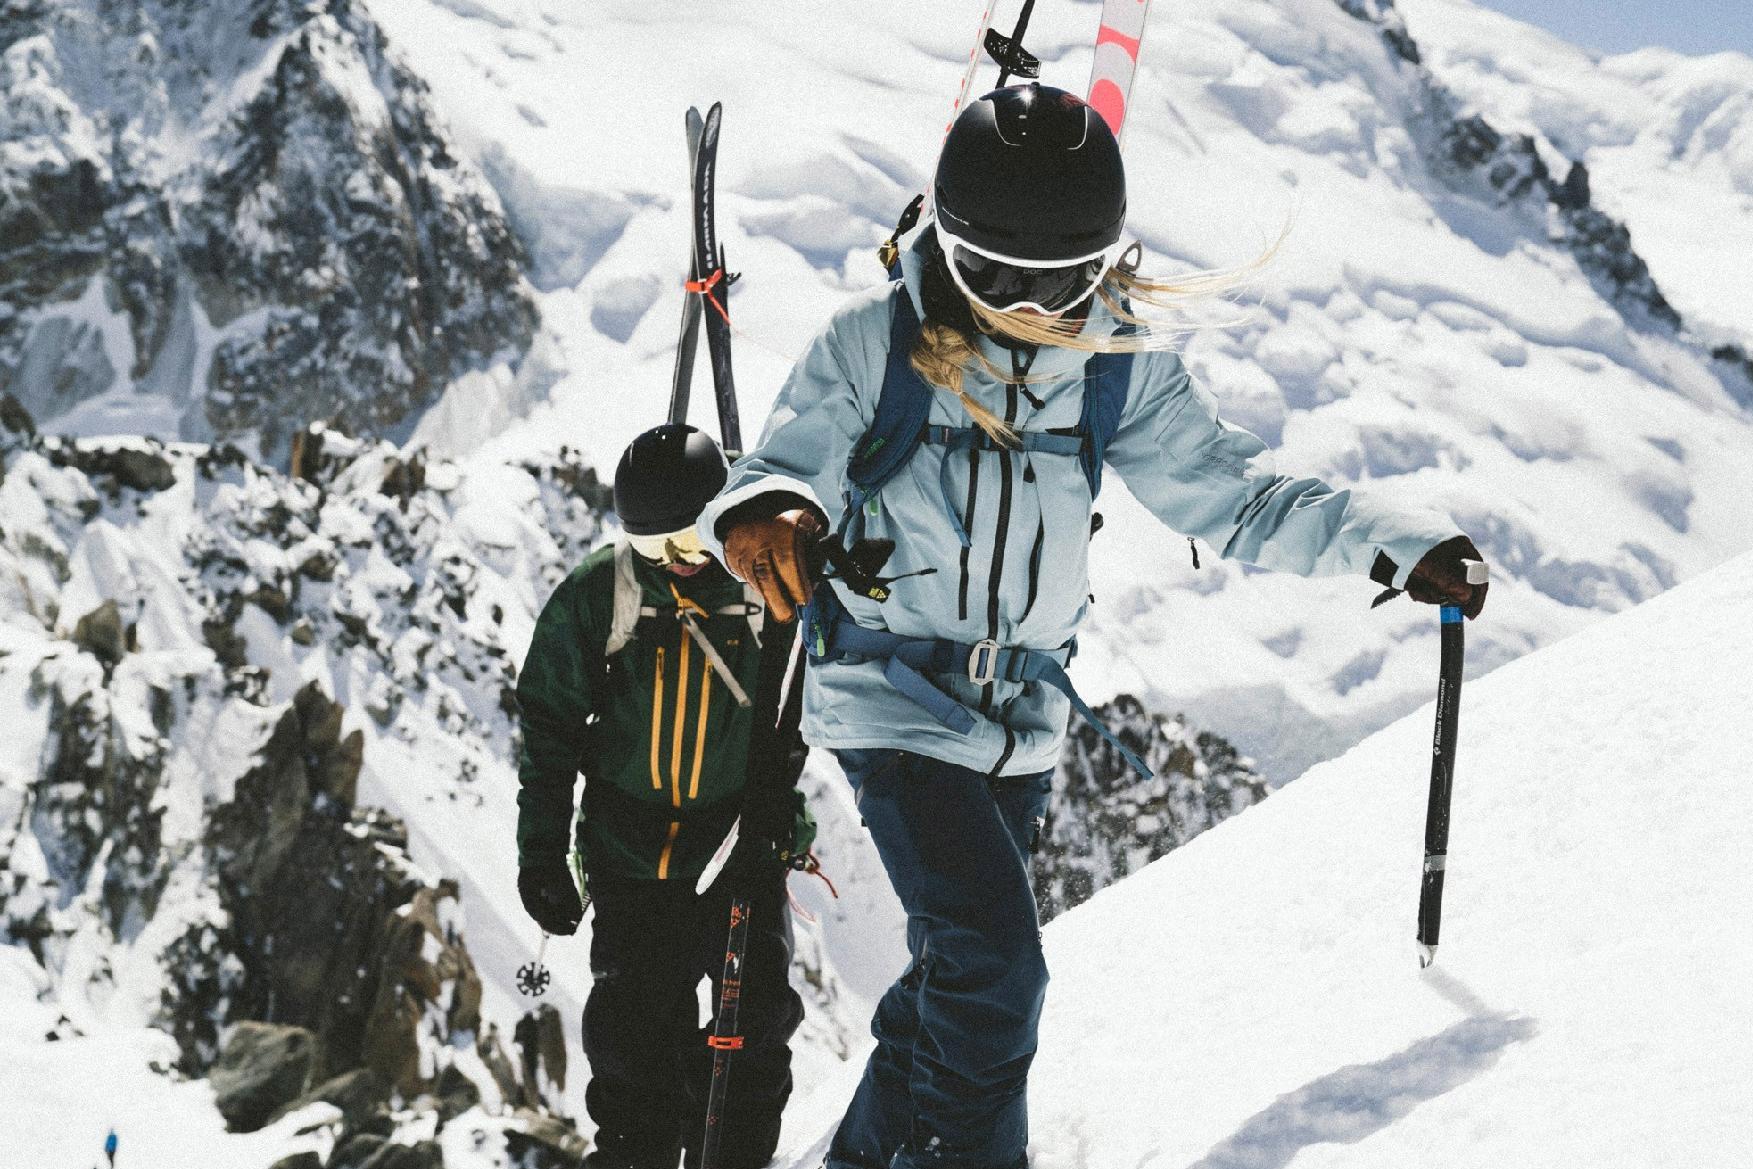 skiers climbing up mountain wearing helmets